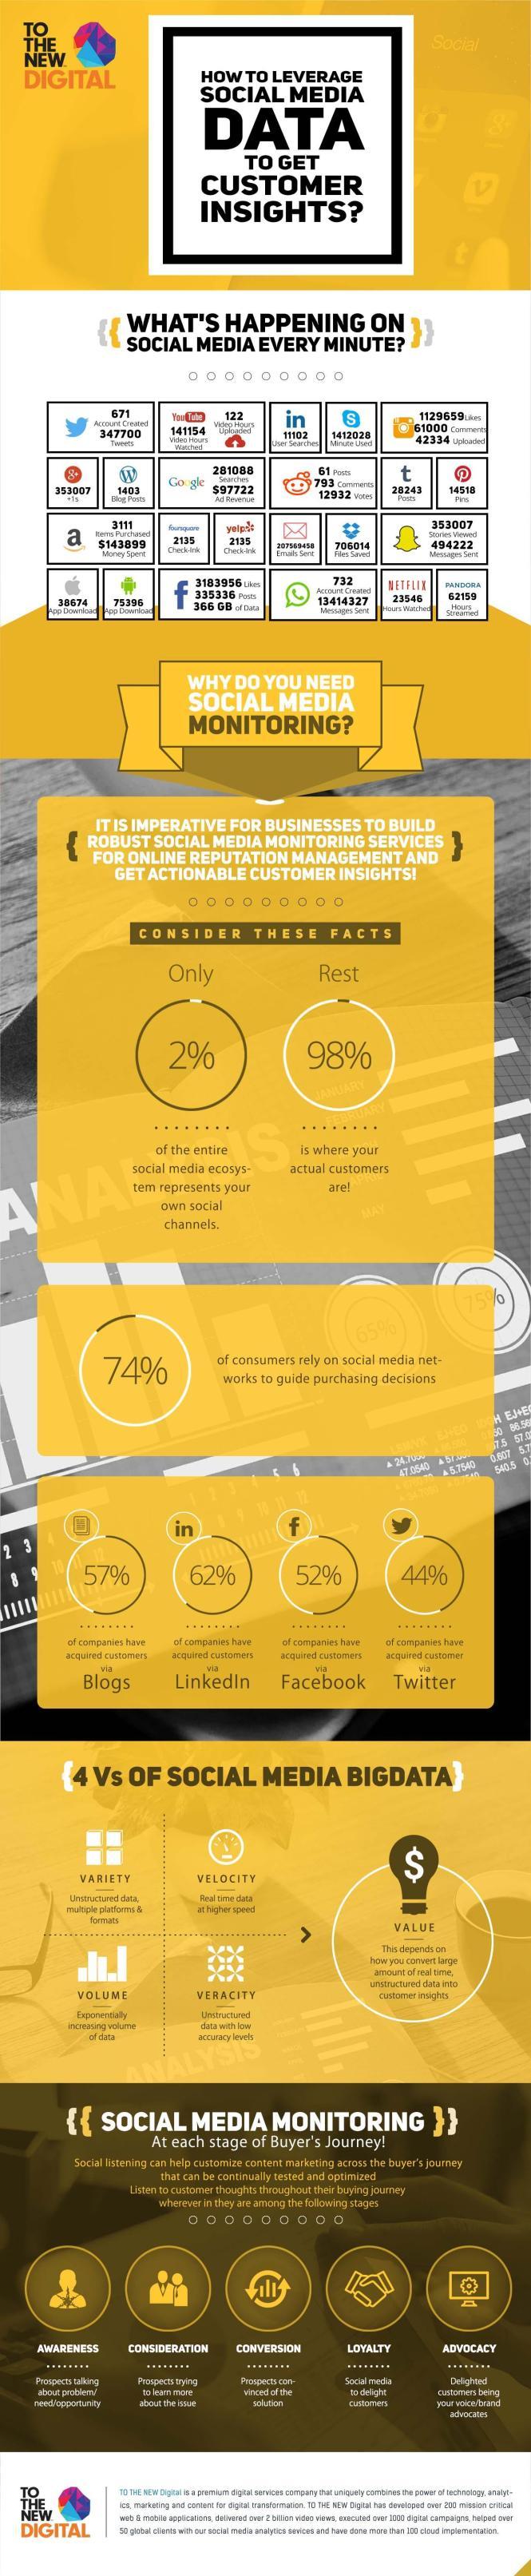 Leverage Social Media Data